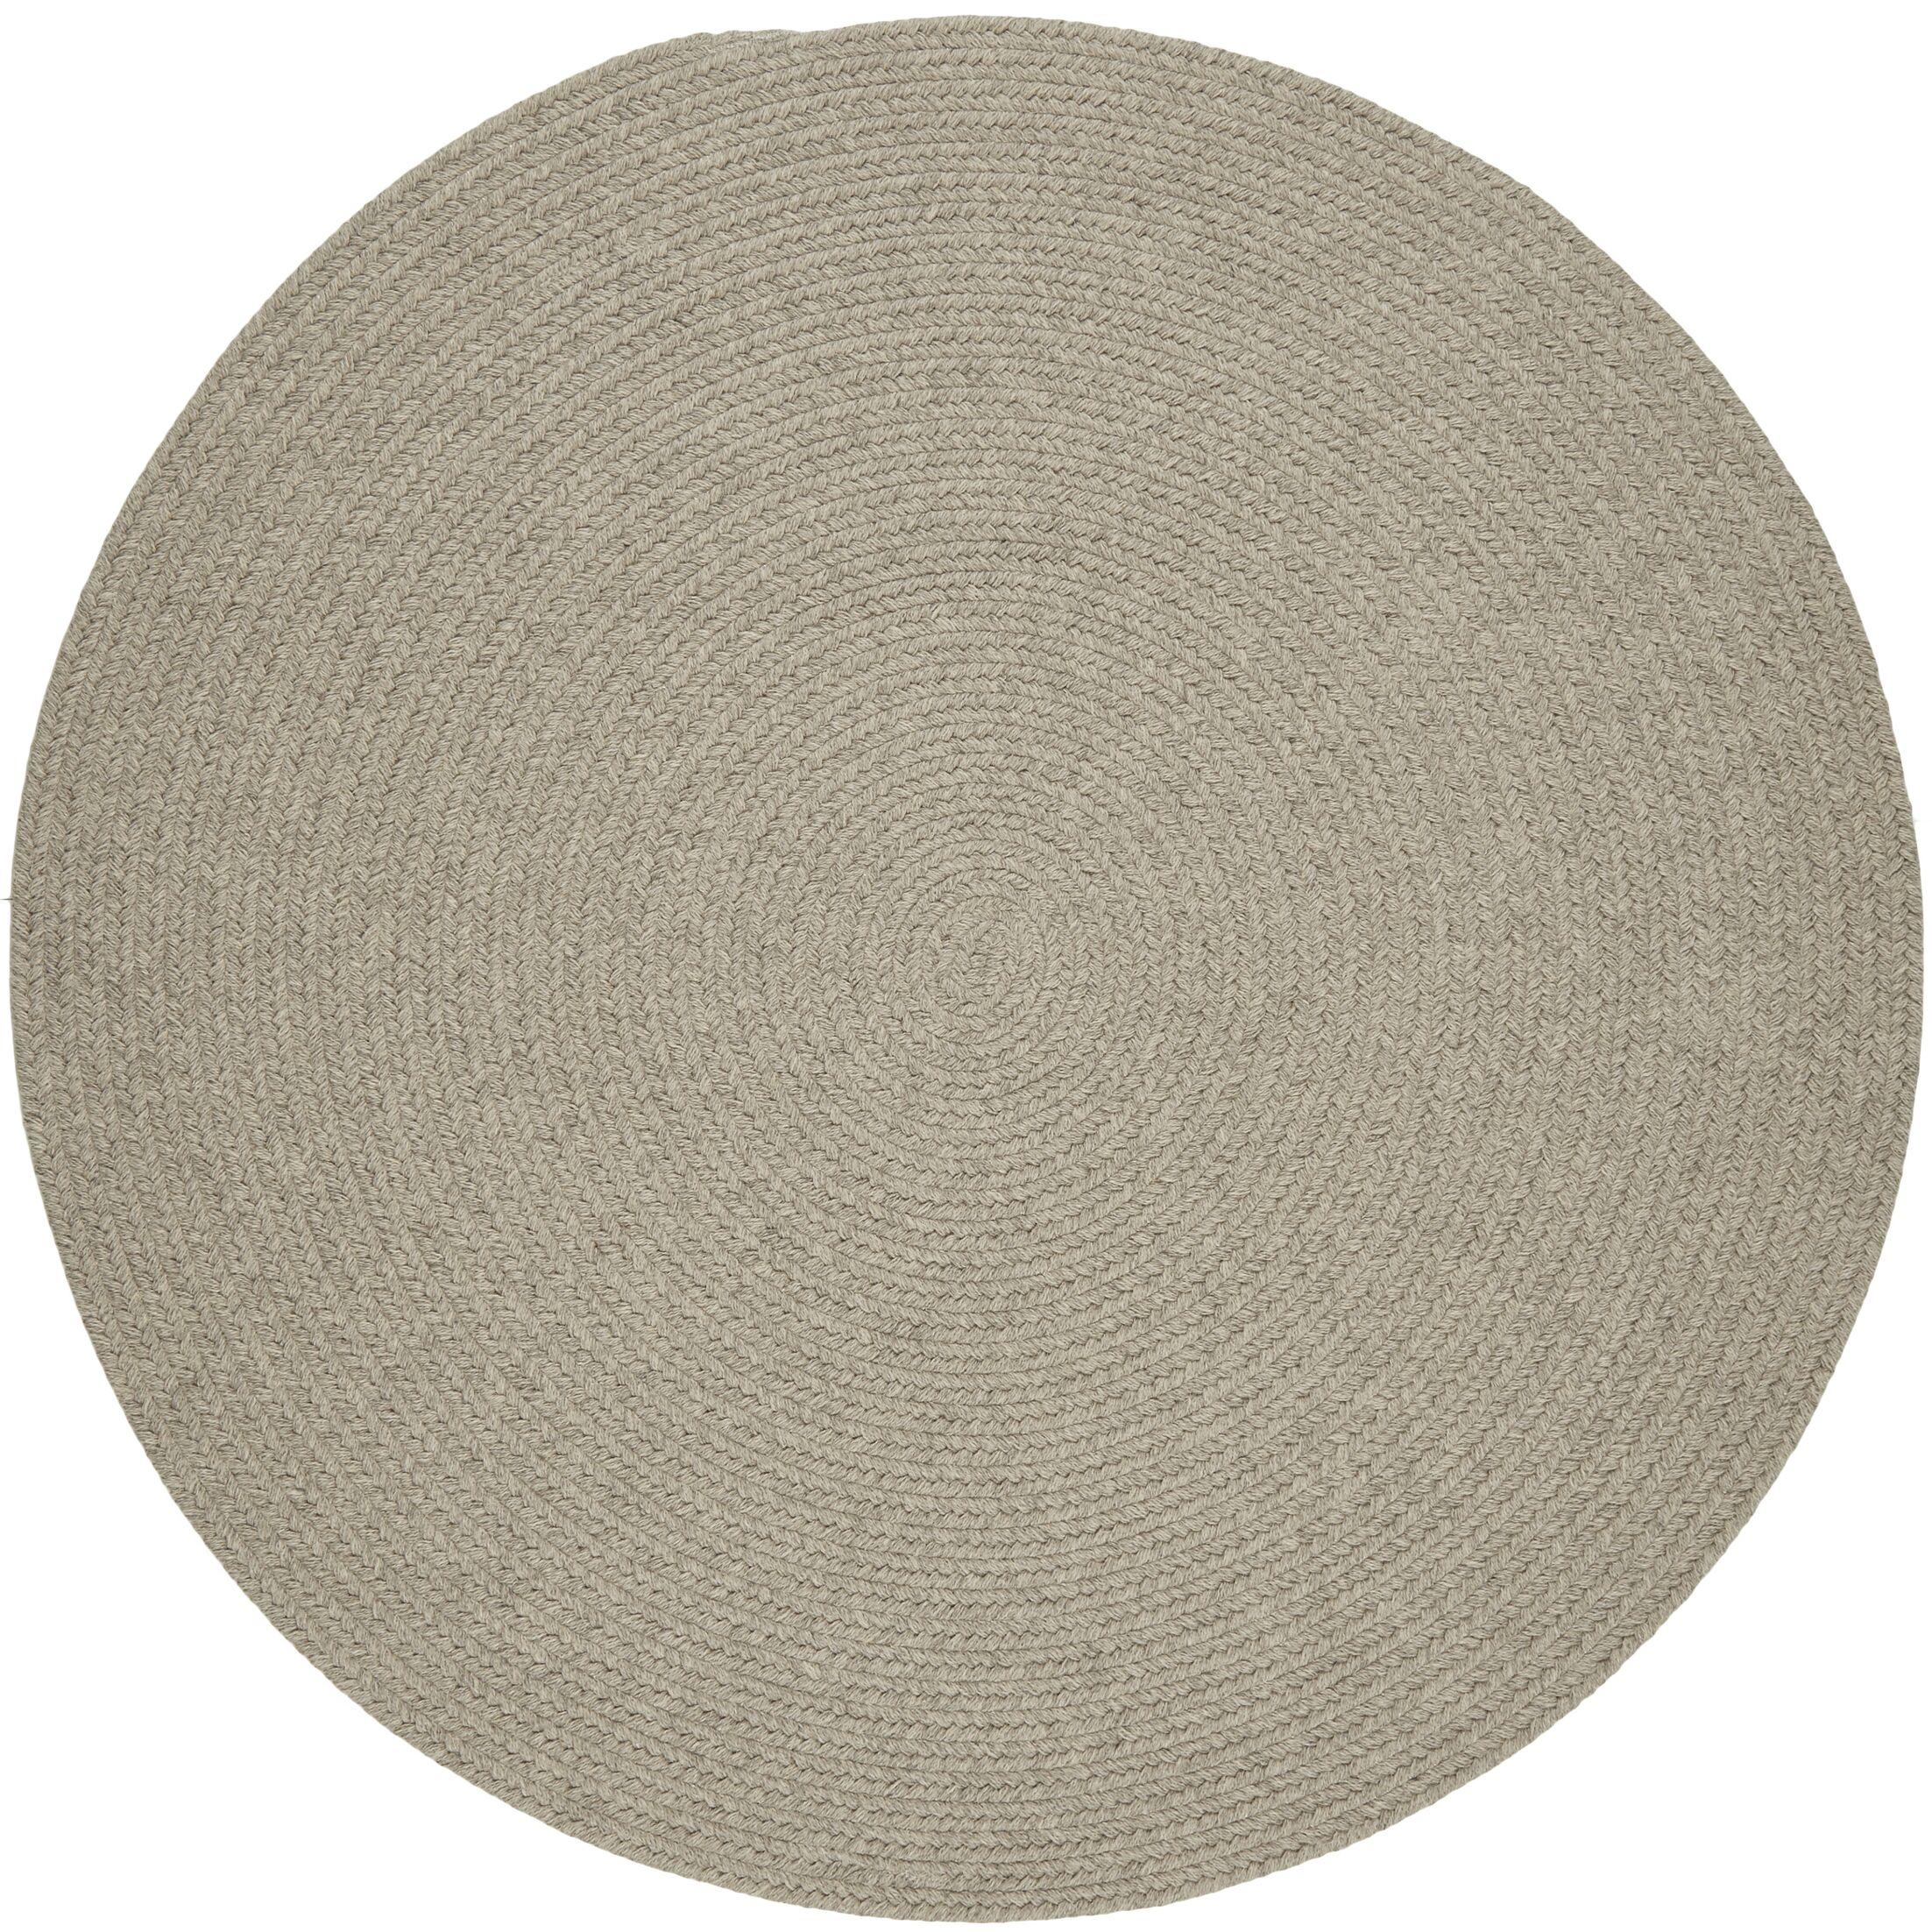 Handmade Light Gray Area Rug Rug Size: Round 10'